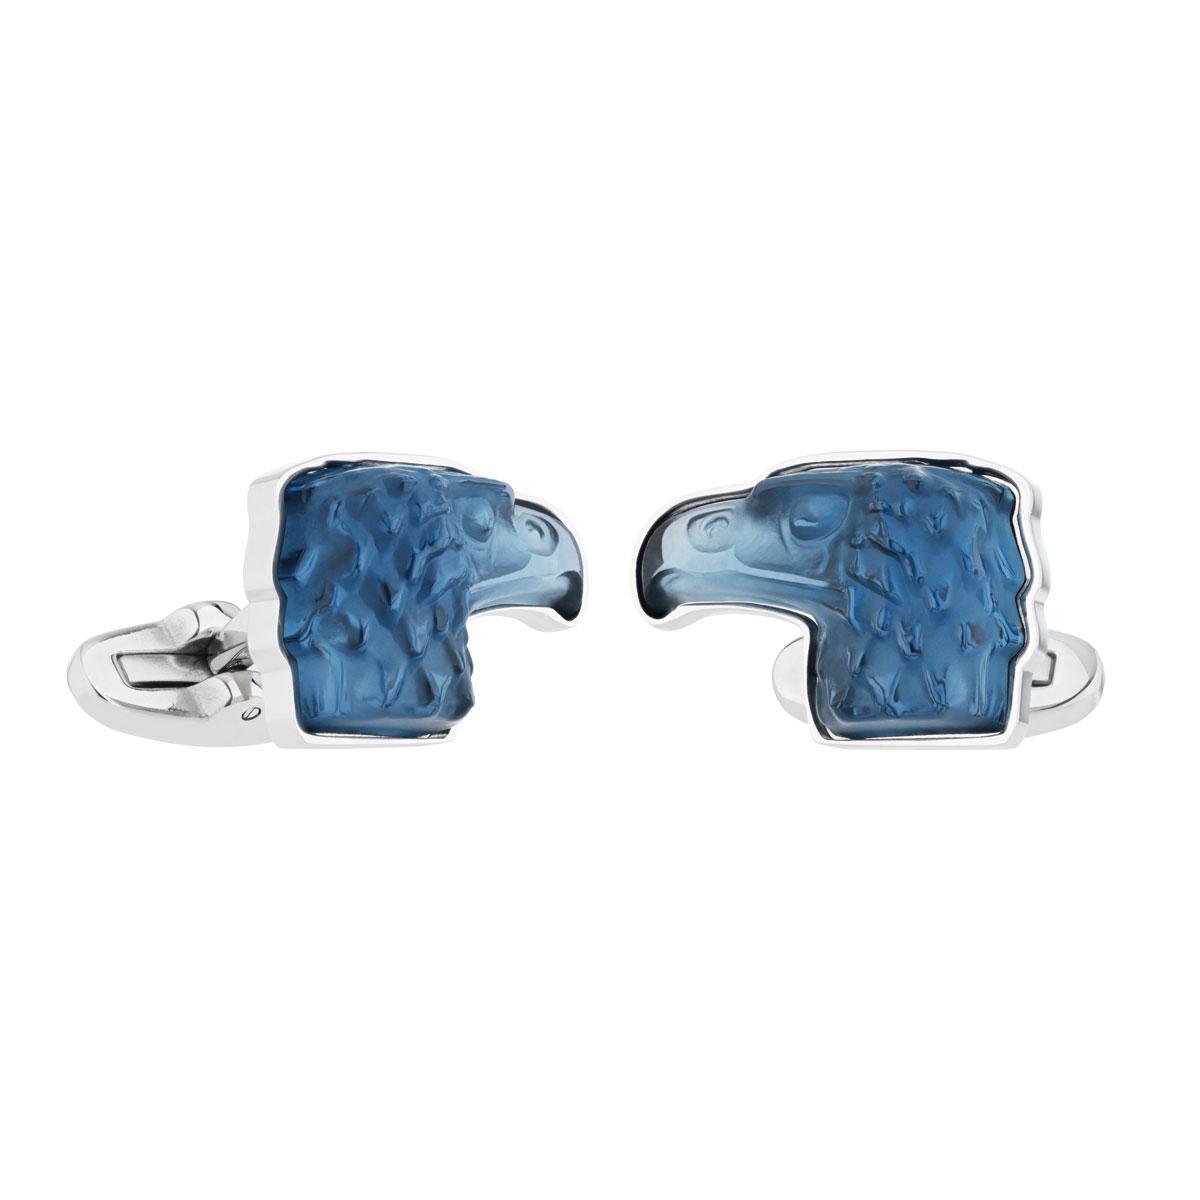 Lalique Crystal Eagle Cufflinks Pair, Sapphire Blue